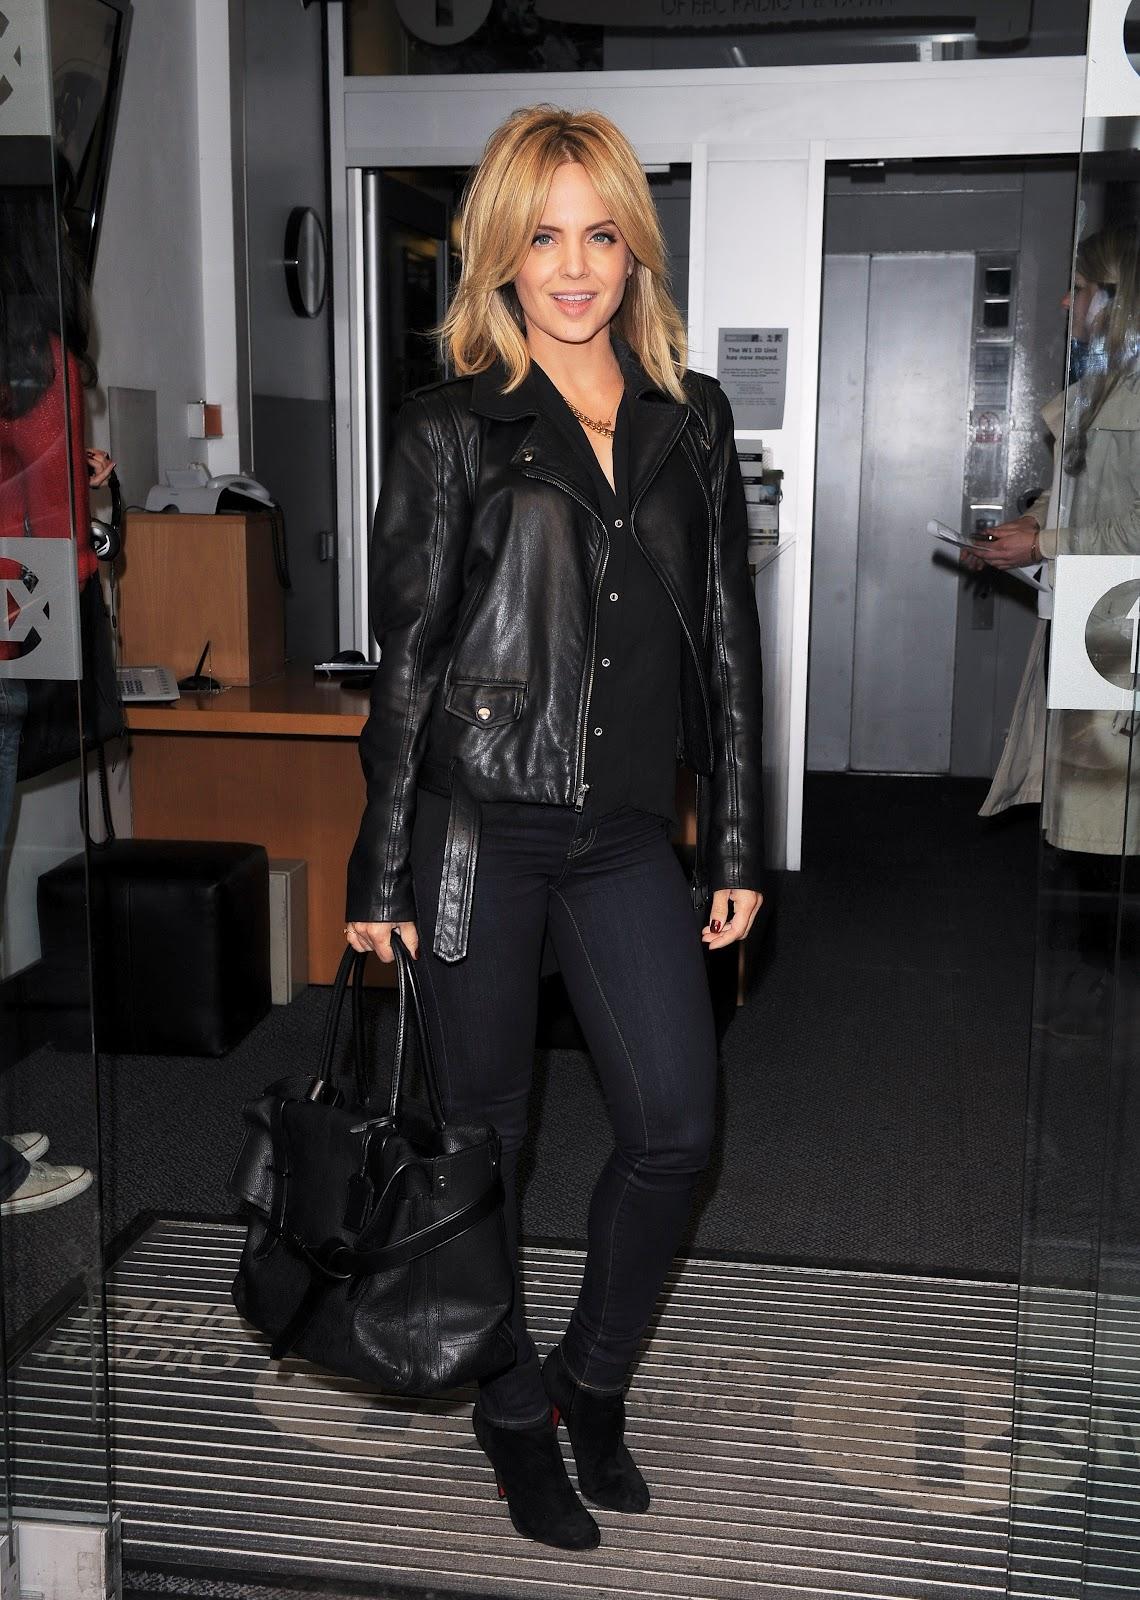 http://1.bp.blogspot.com/-LvjF_FOXR7c/UG4tyc8S9pI/AAAAAAAAQqg/wNmo9AWNdYk/s1600/Mena+Suvari+was+spotted+at+BBC+Radio+1+Studios+in+London+on+October+4th+2012.jpg